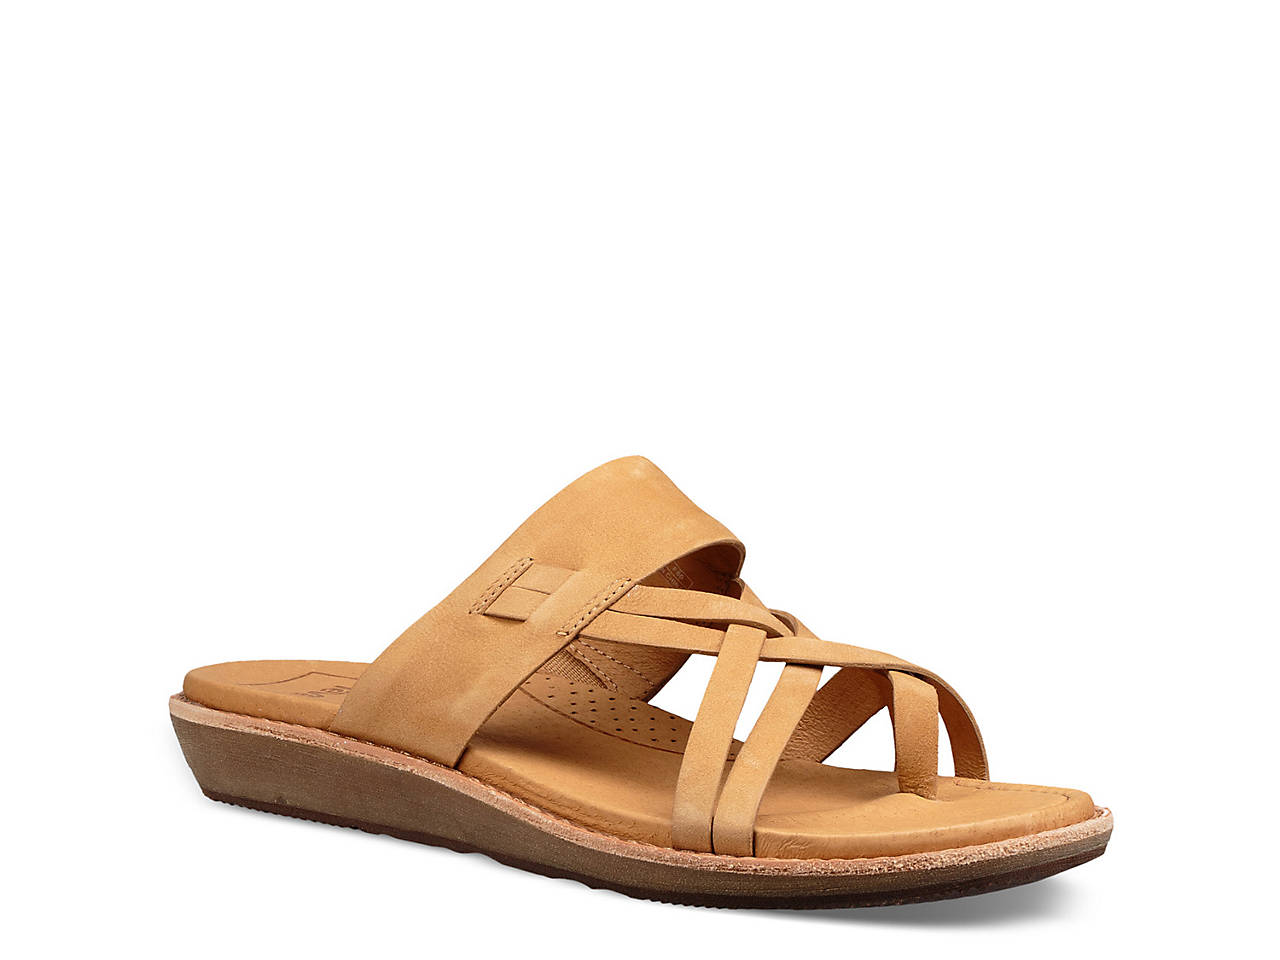 f06d69f502e2 Teva Encanta Wedge Sandal Women s Shoes